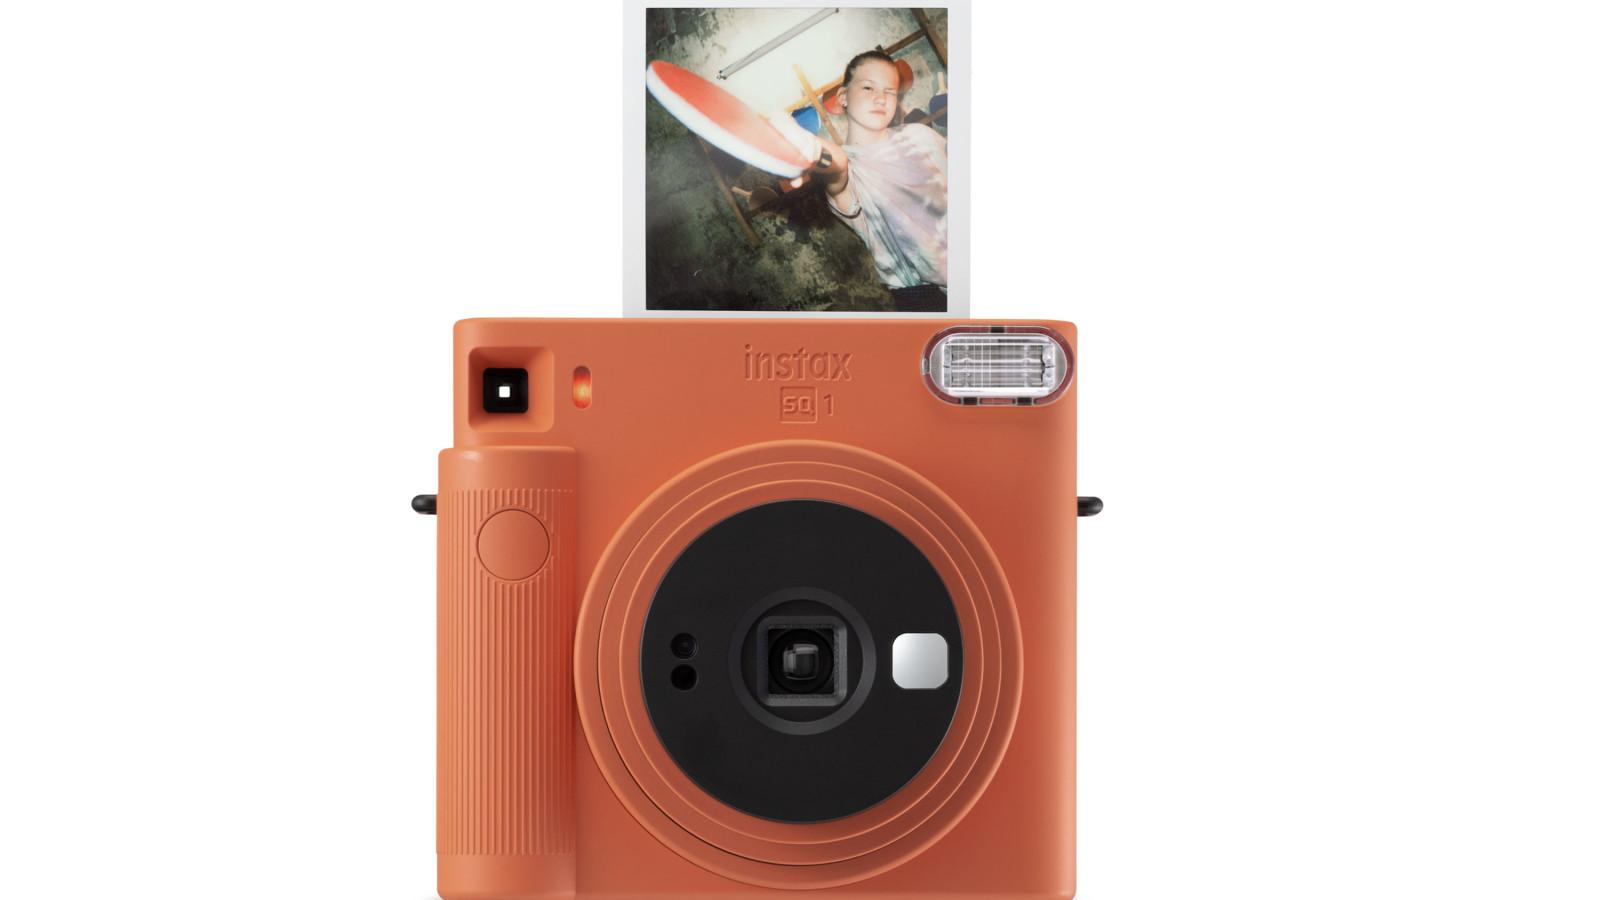 FujiFilm Instax Square SQ1, Sofortbildkamera, Polaroid Kamera